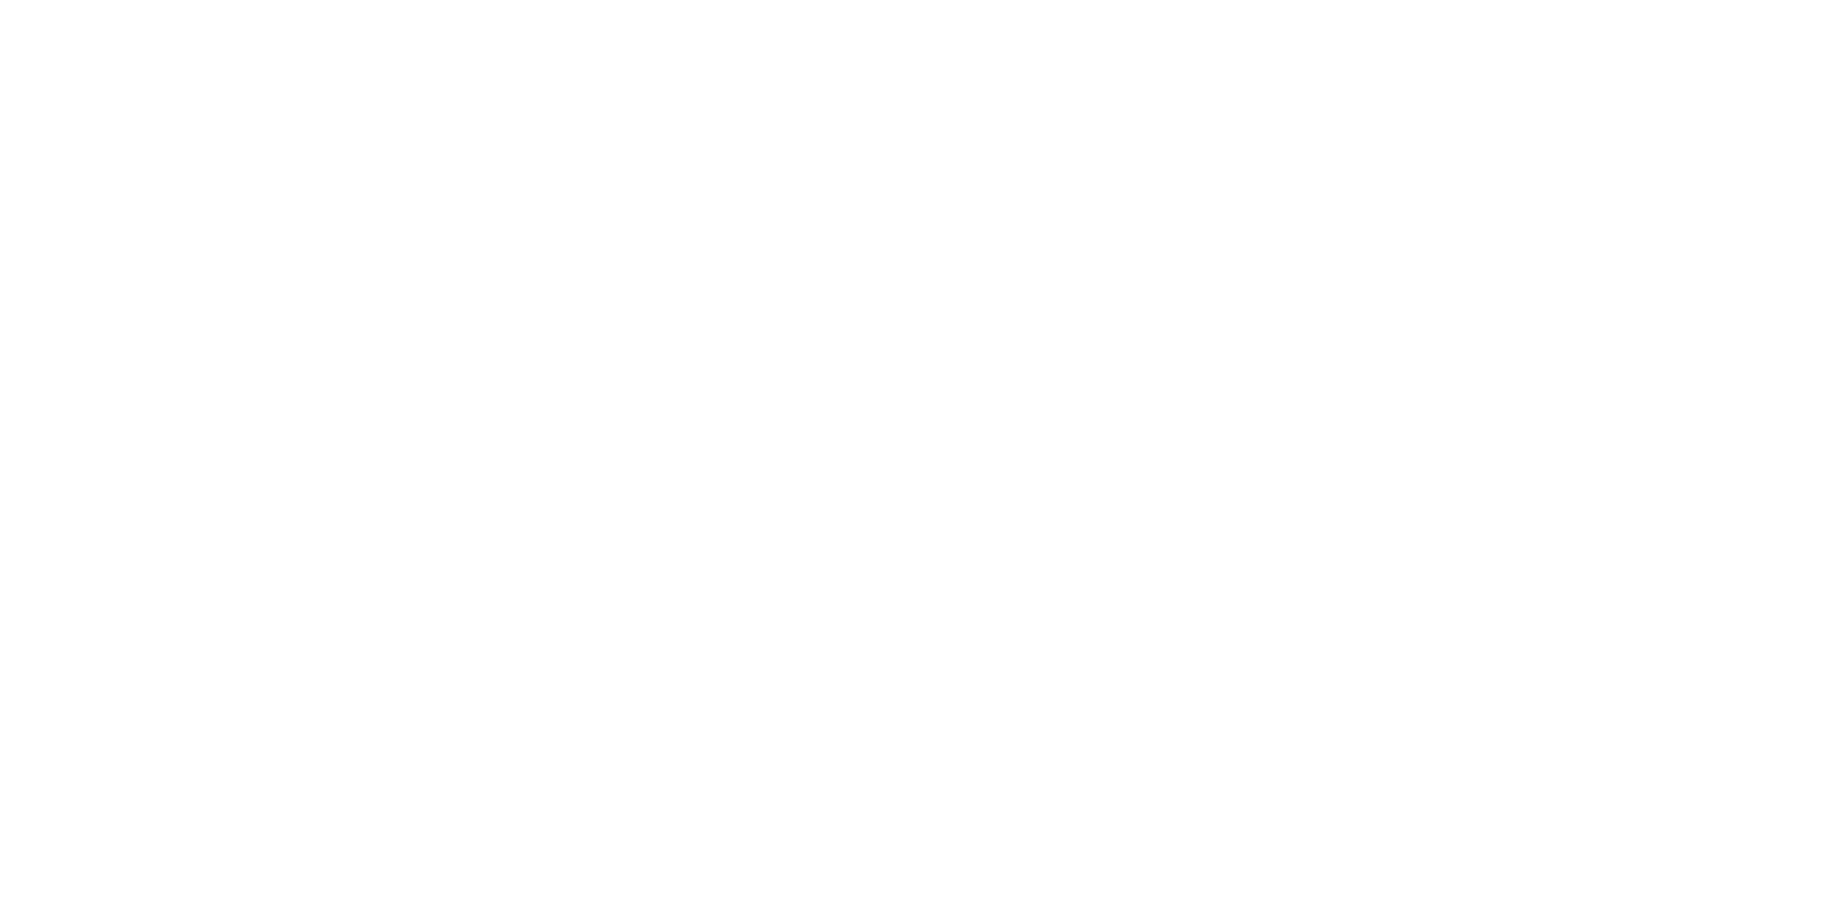 CRICMELA